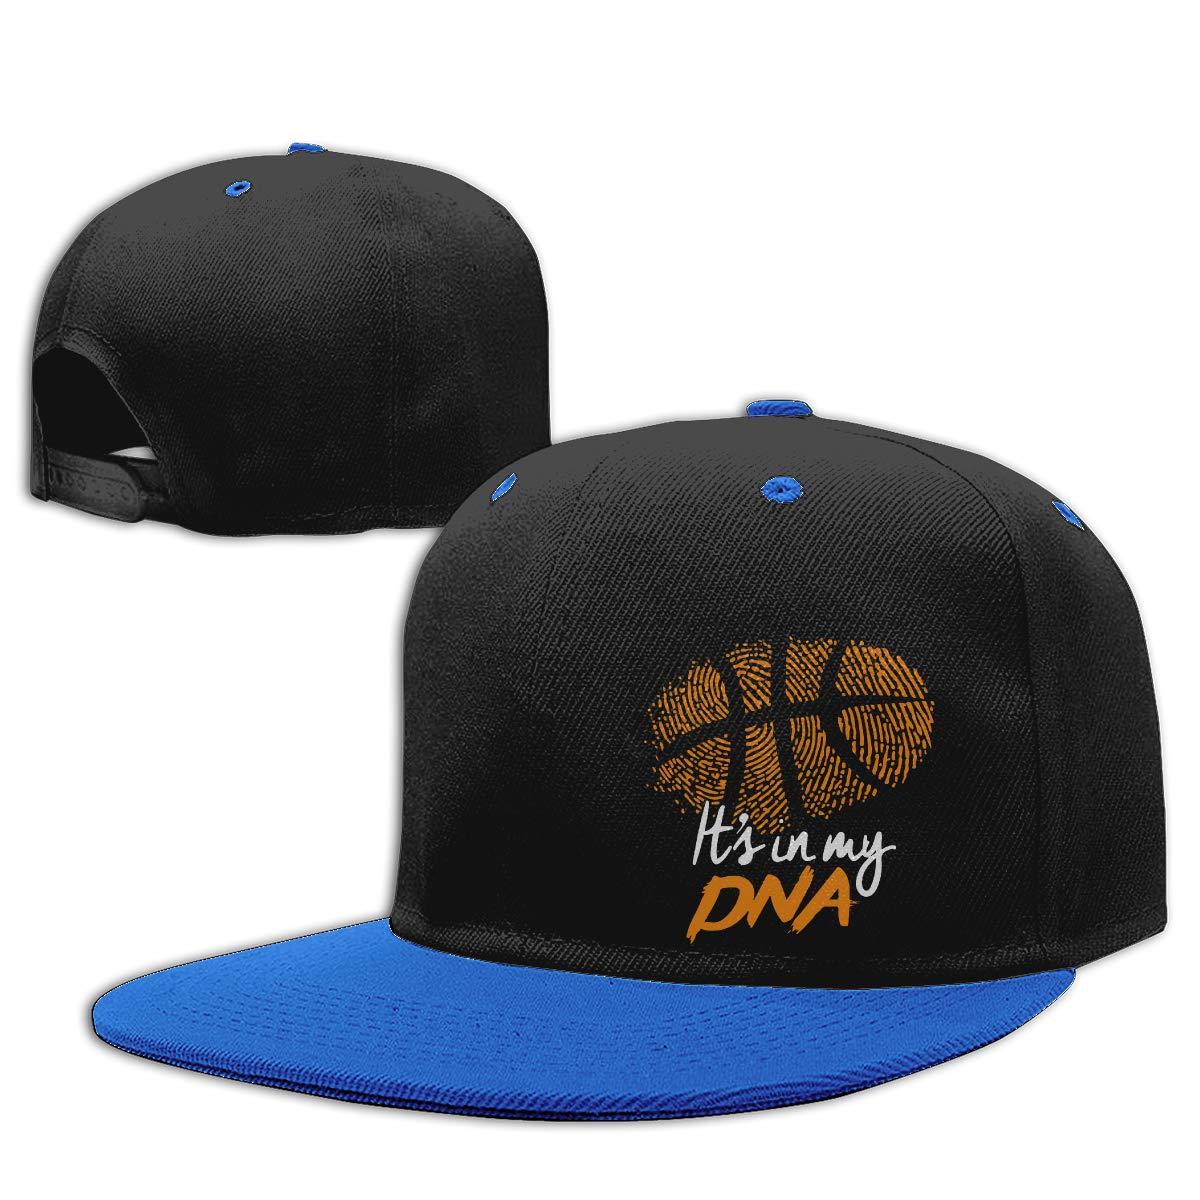 Men Womens Hiphop Cap Basketball Its in My DNA Printed Hip Hop Baseball Caps